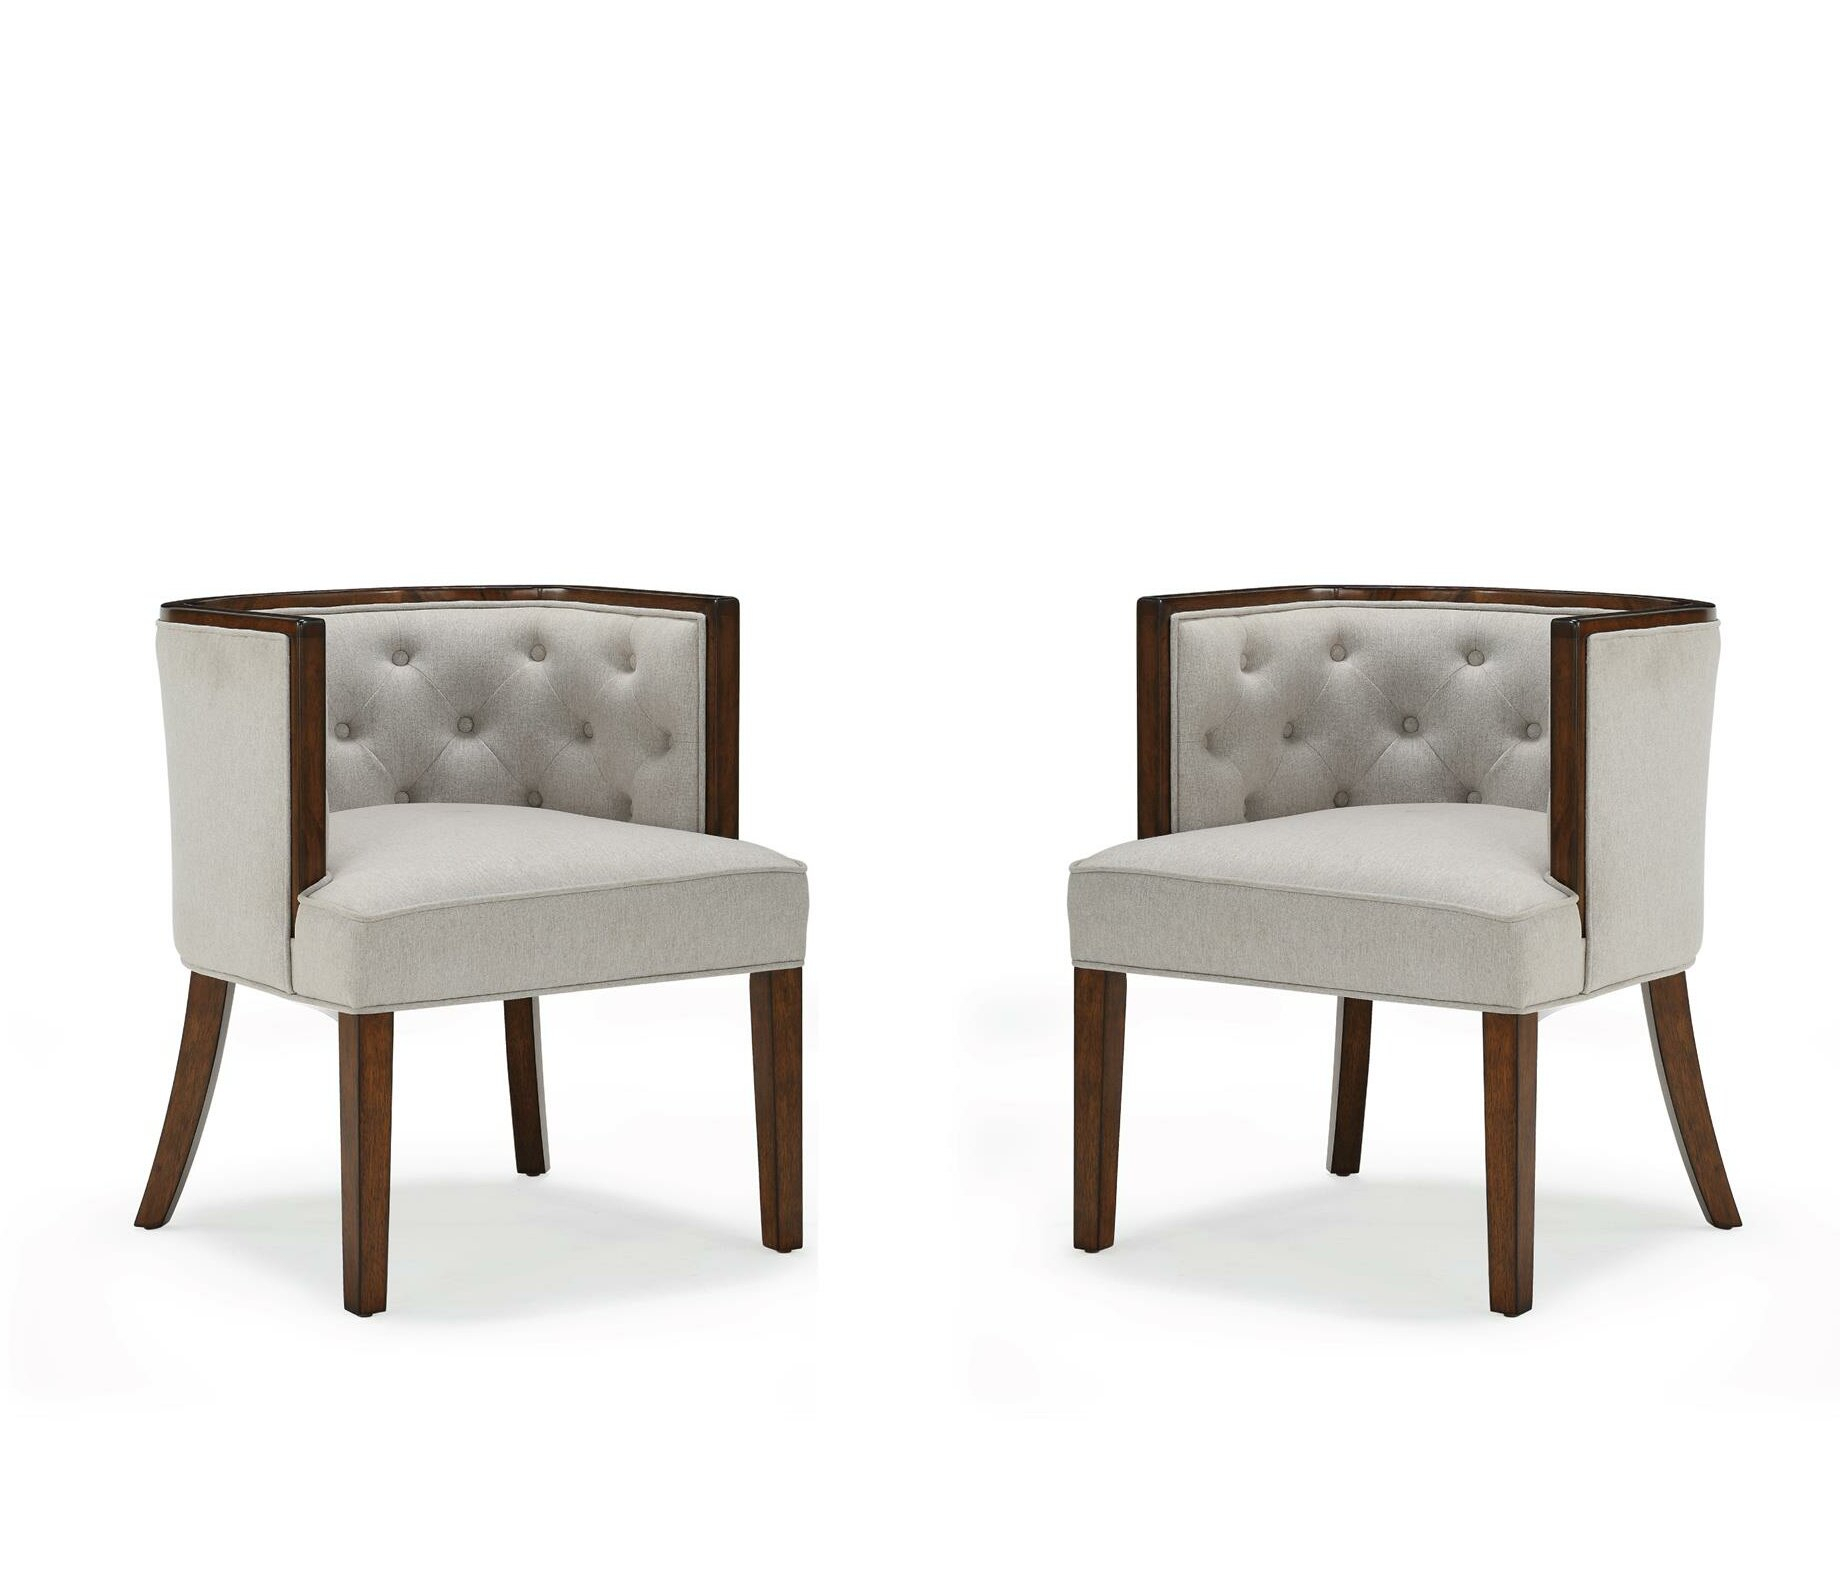 "Danny 20"" Barrel Chair (Set Of 2) Inside Ziaa Barrel Chairs (View 11 of 15)"